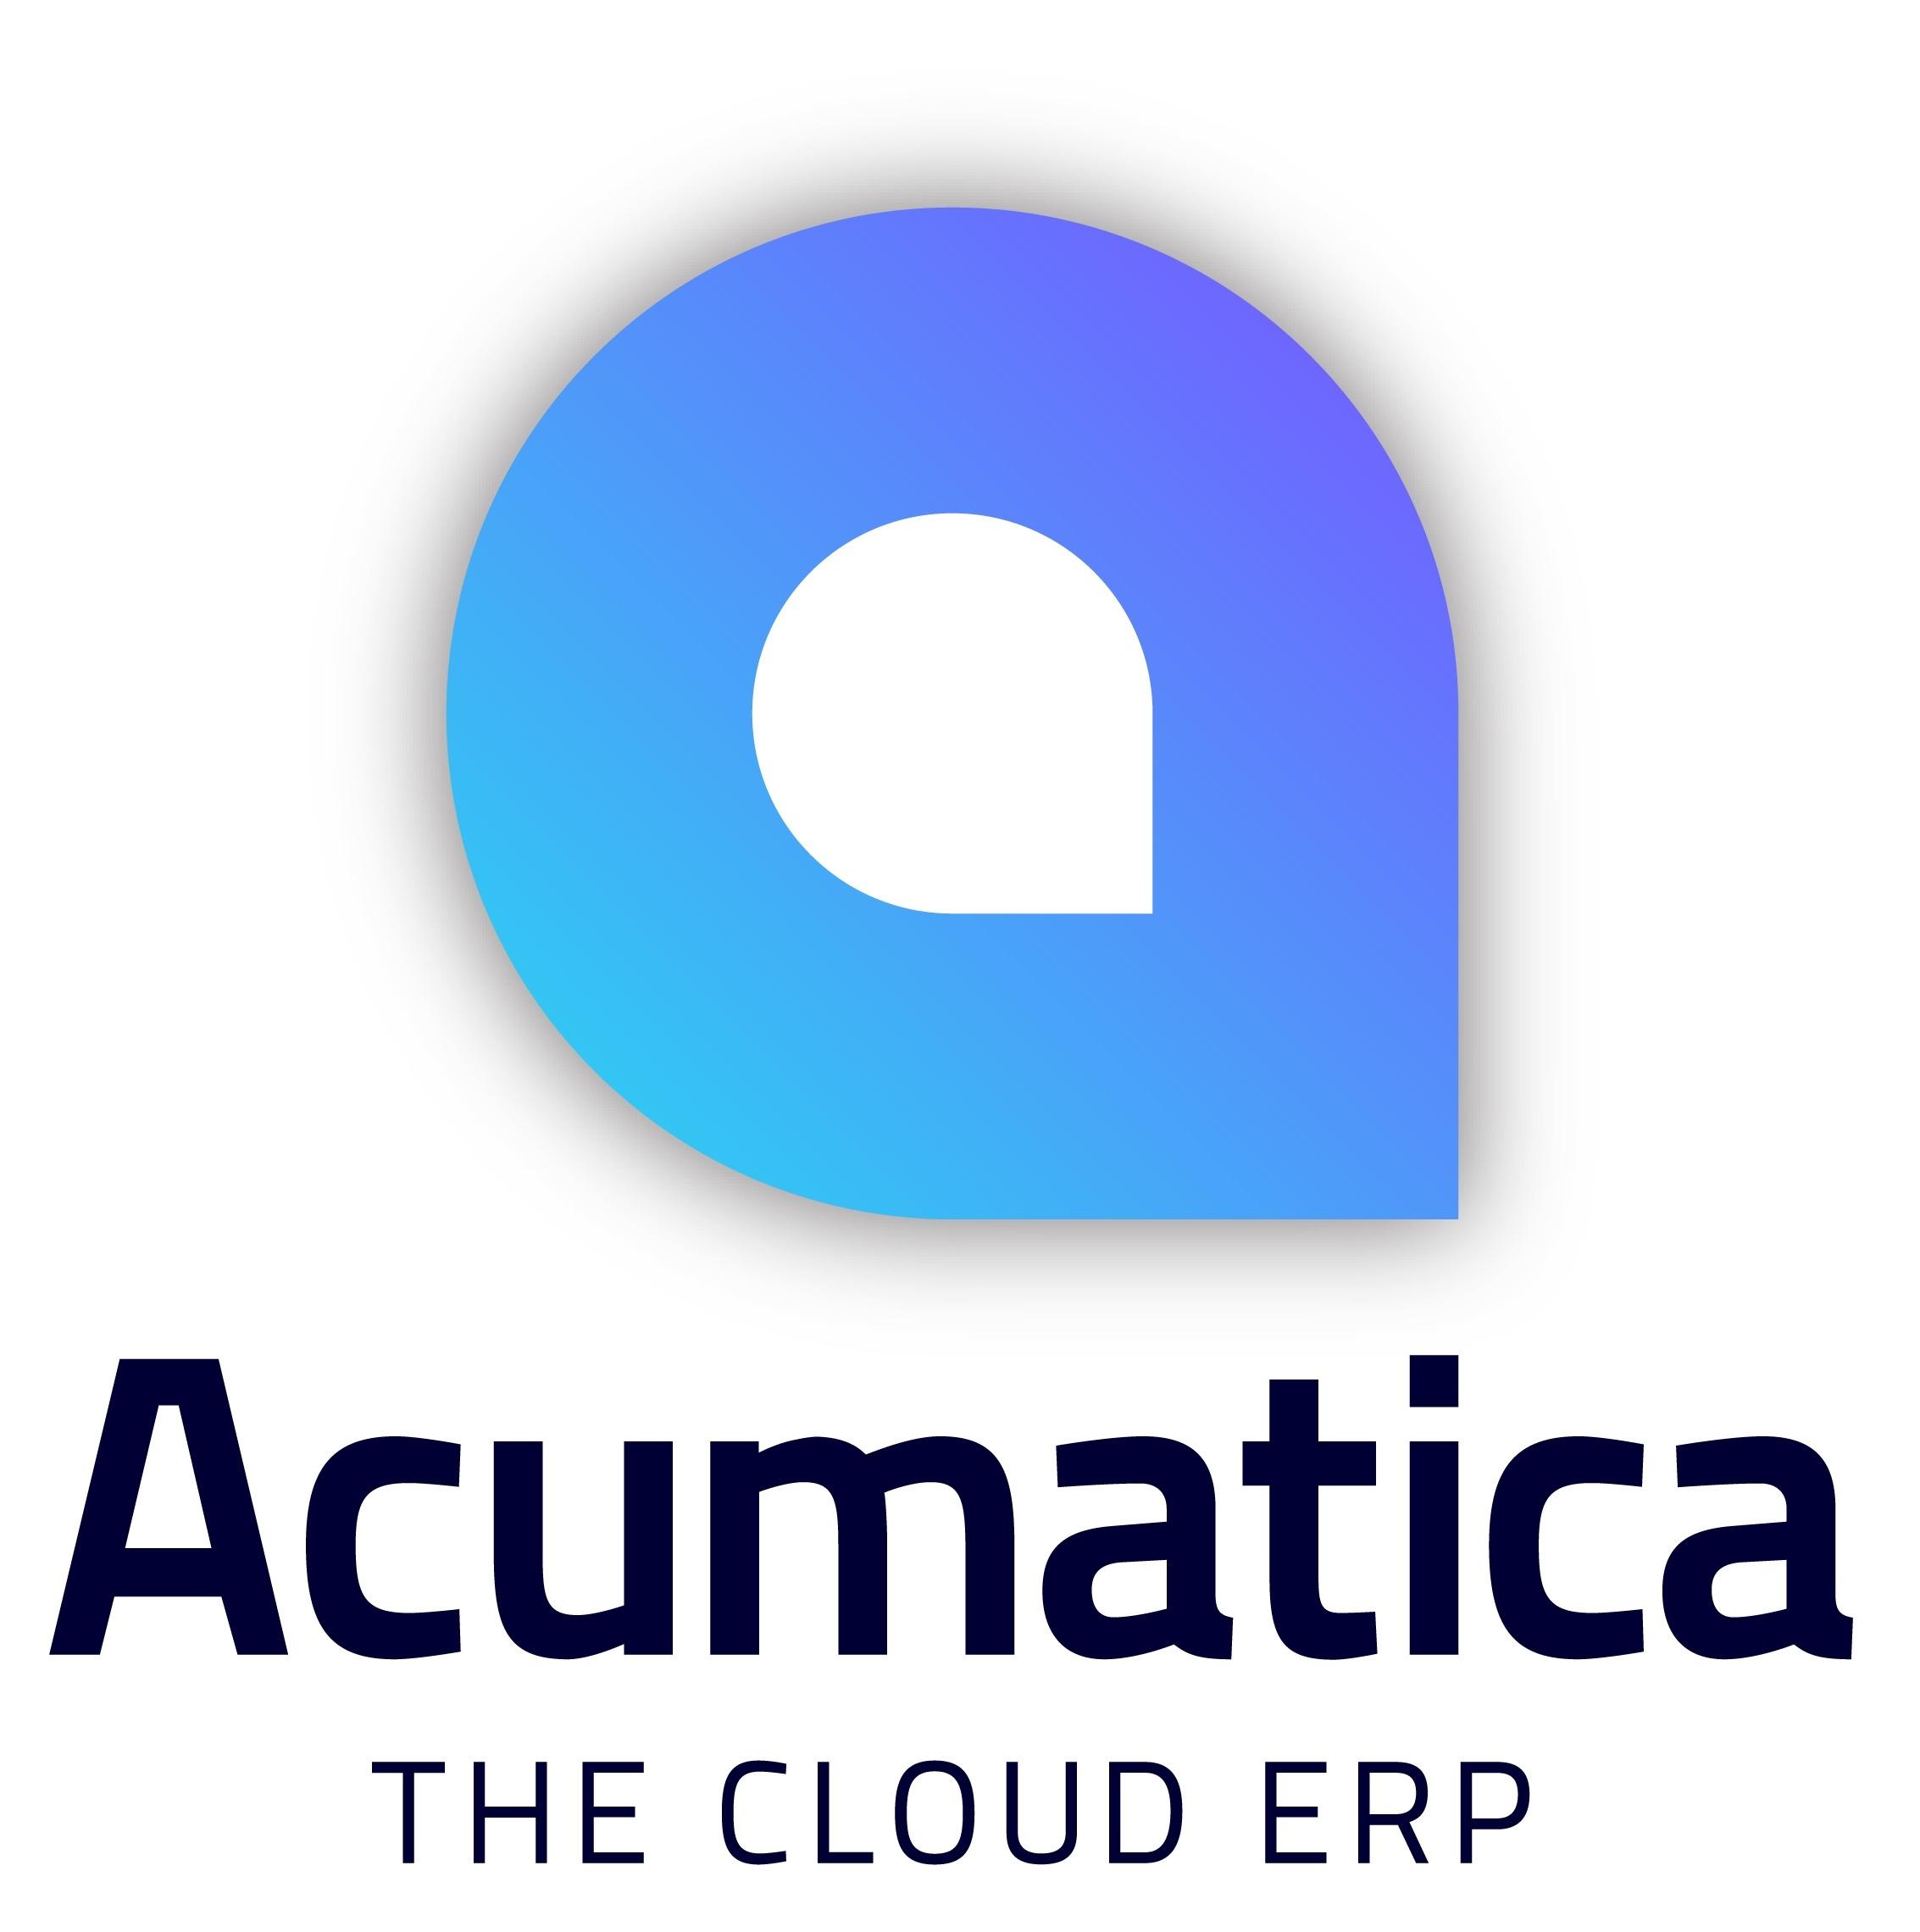 Acumatica Summit 2018: What We Learned